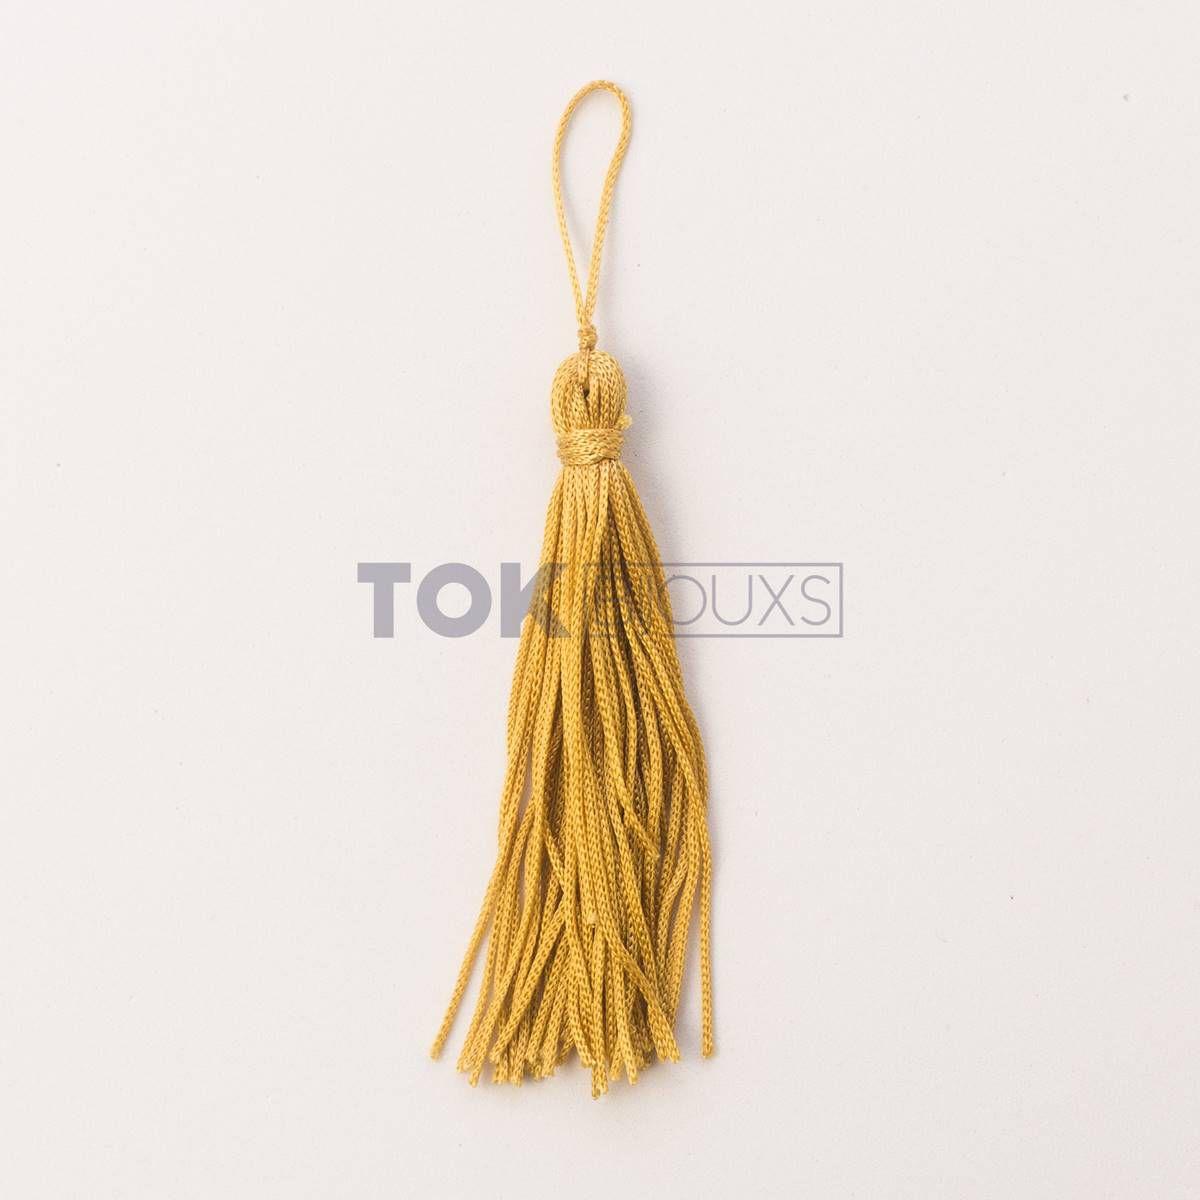 Pingente De Seda - Tassel - Dourado - Unidade